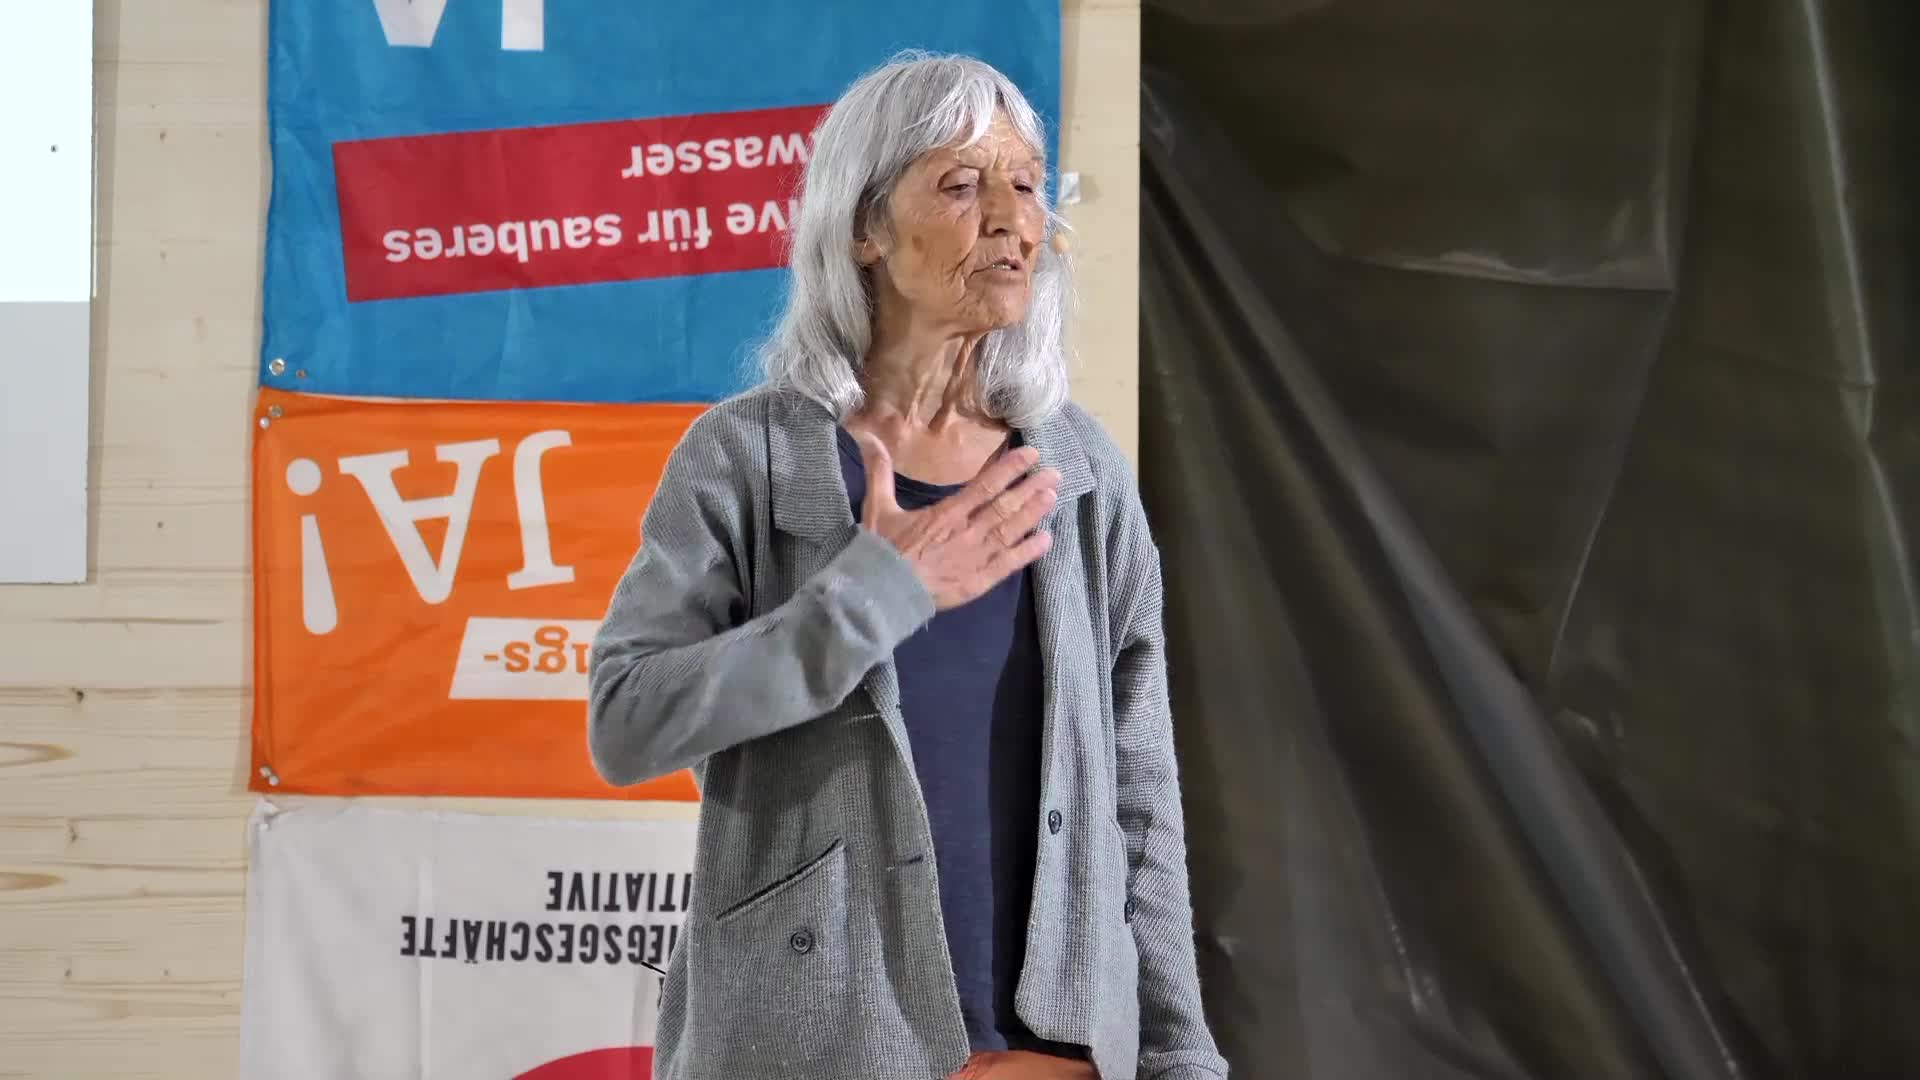 Weff 2021 - Vortrag Daniela Rupp